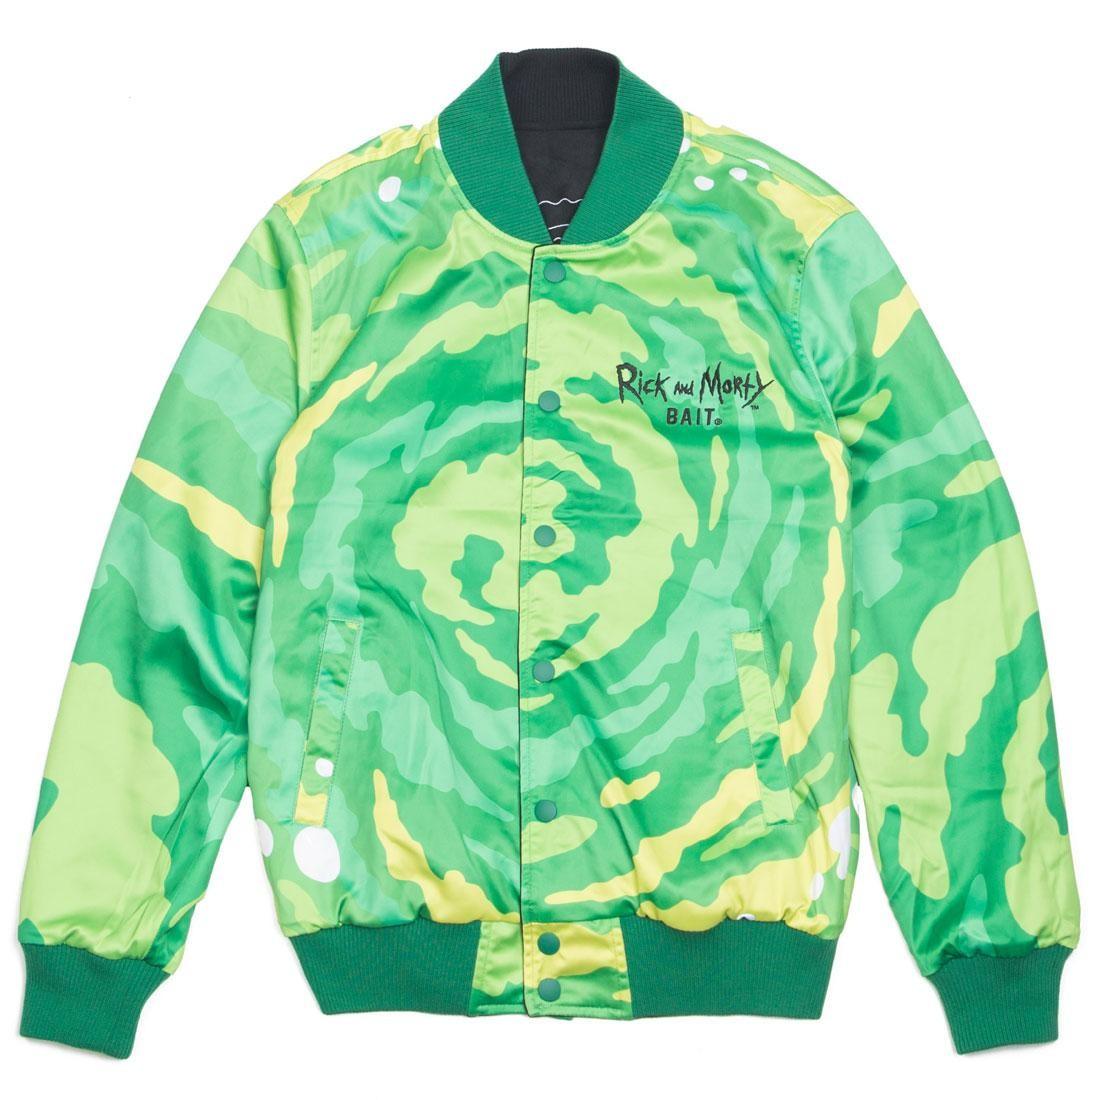 BAIT x Rick And Morty Men Reversible Varsity Jacket (black)